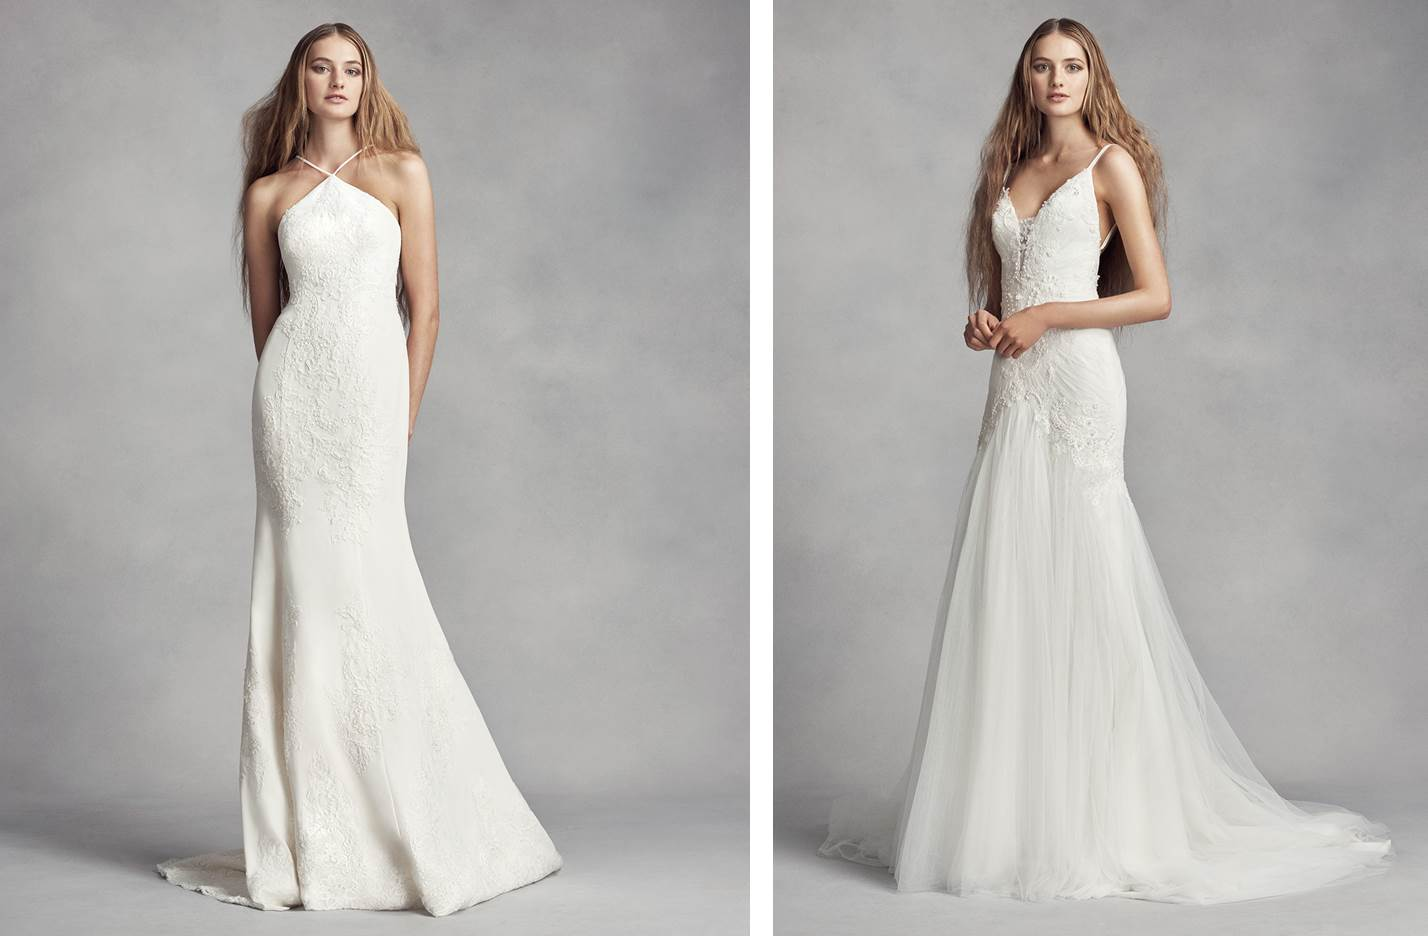 WHITE by Vera Wang Sheath Wedding Dresses